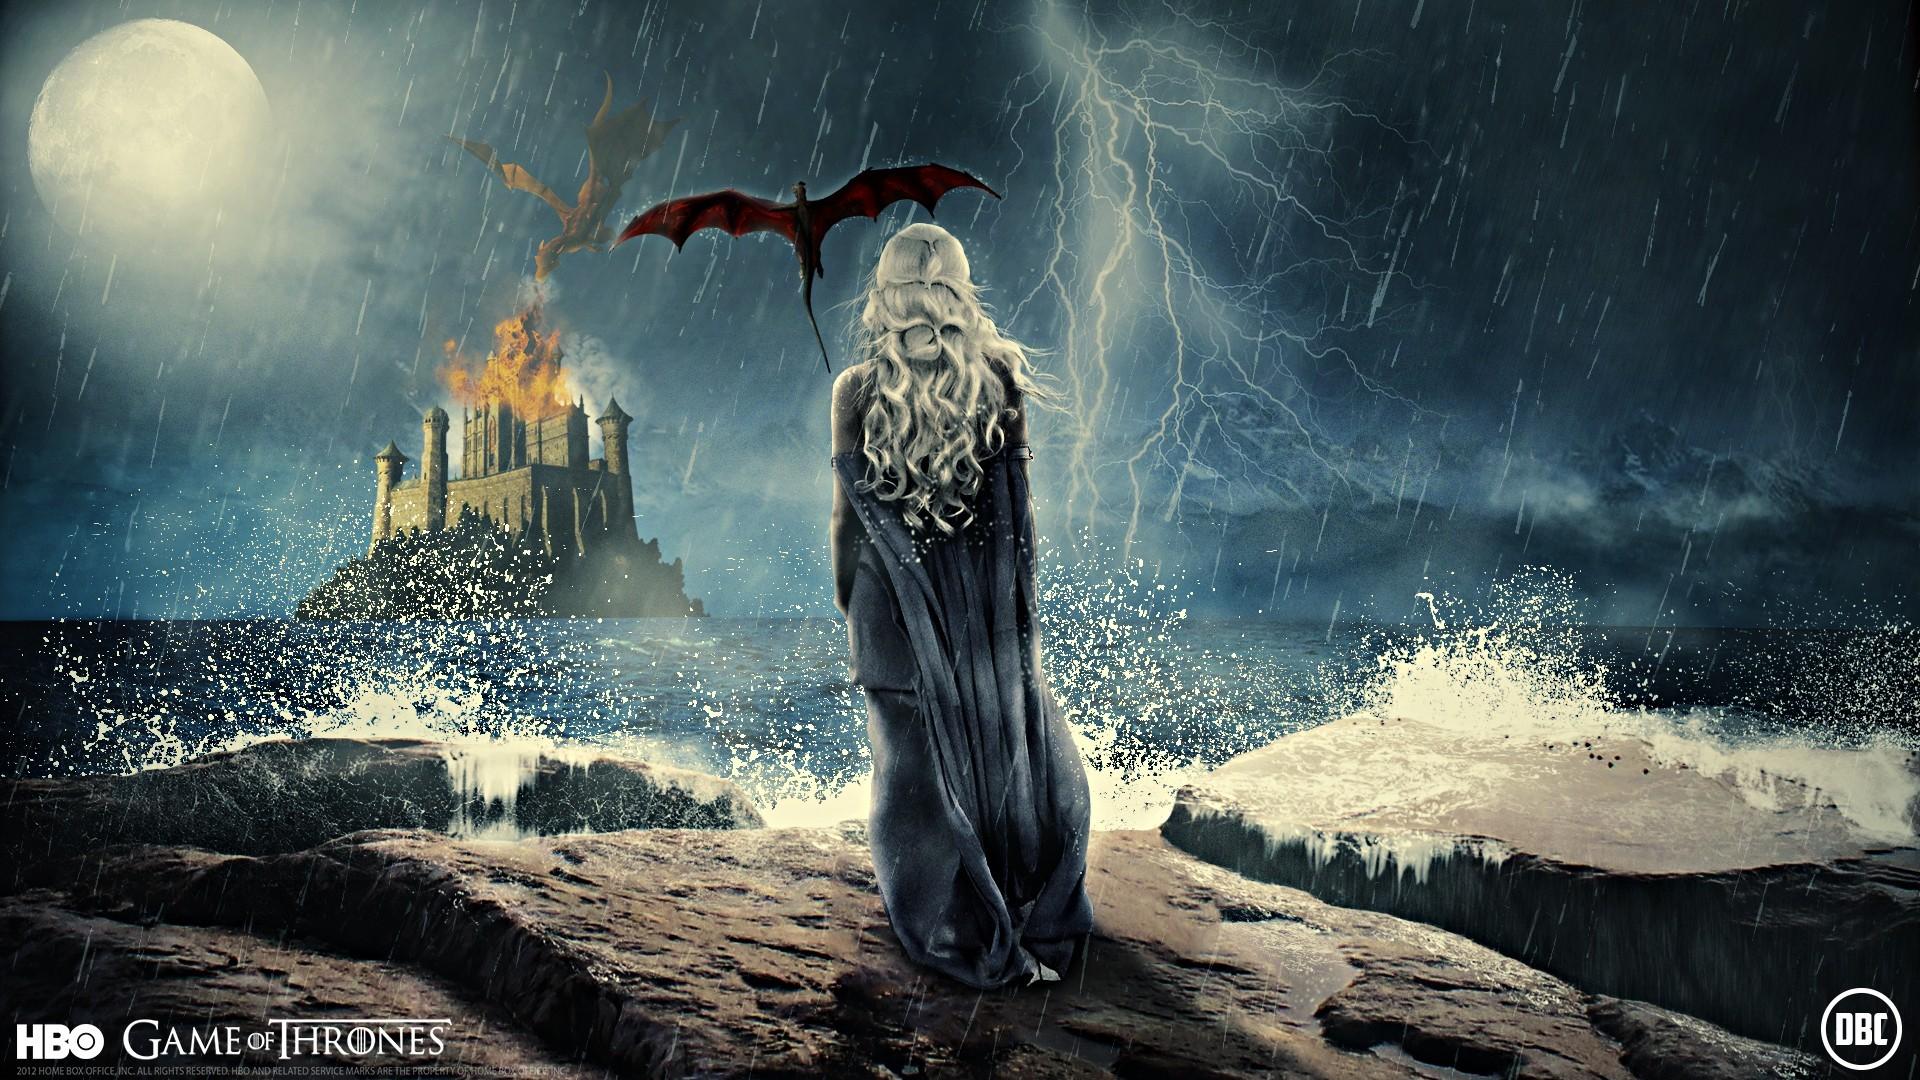 Game Of Thrones Wallpaper Hd Download Free Beautiful Hd